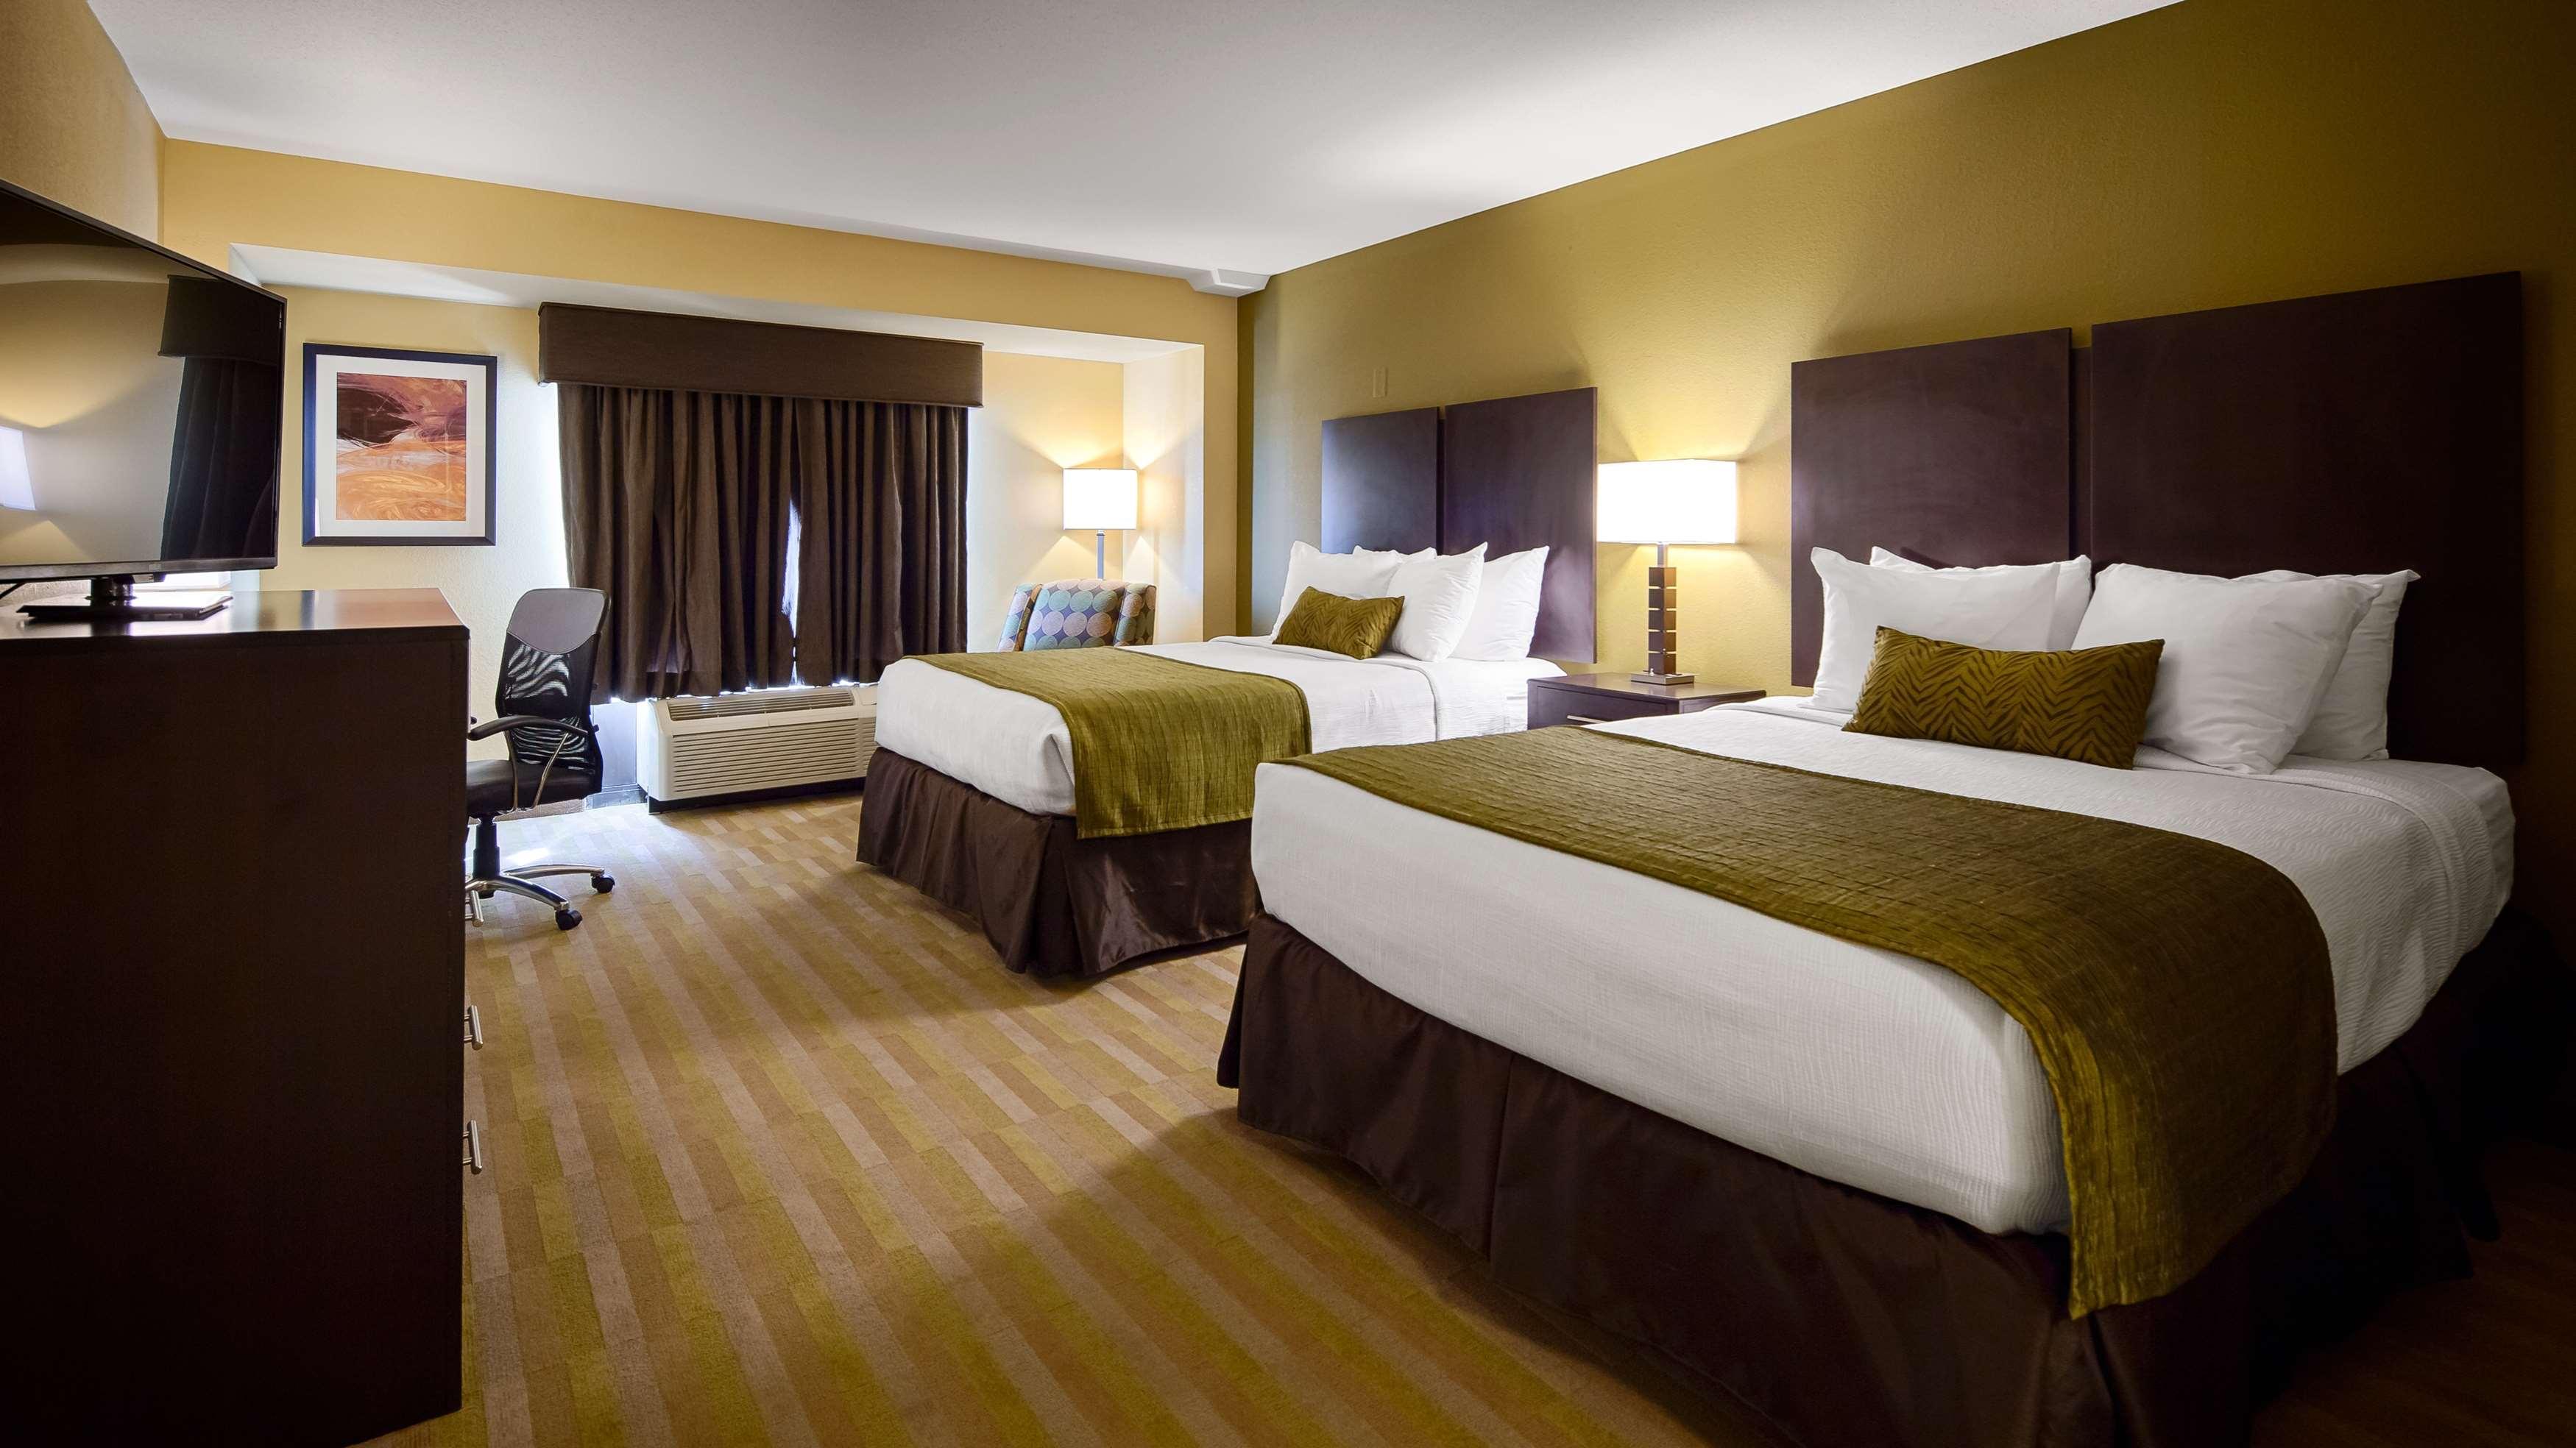 Best Western Plus Thornburg Inn & Suites image 23